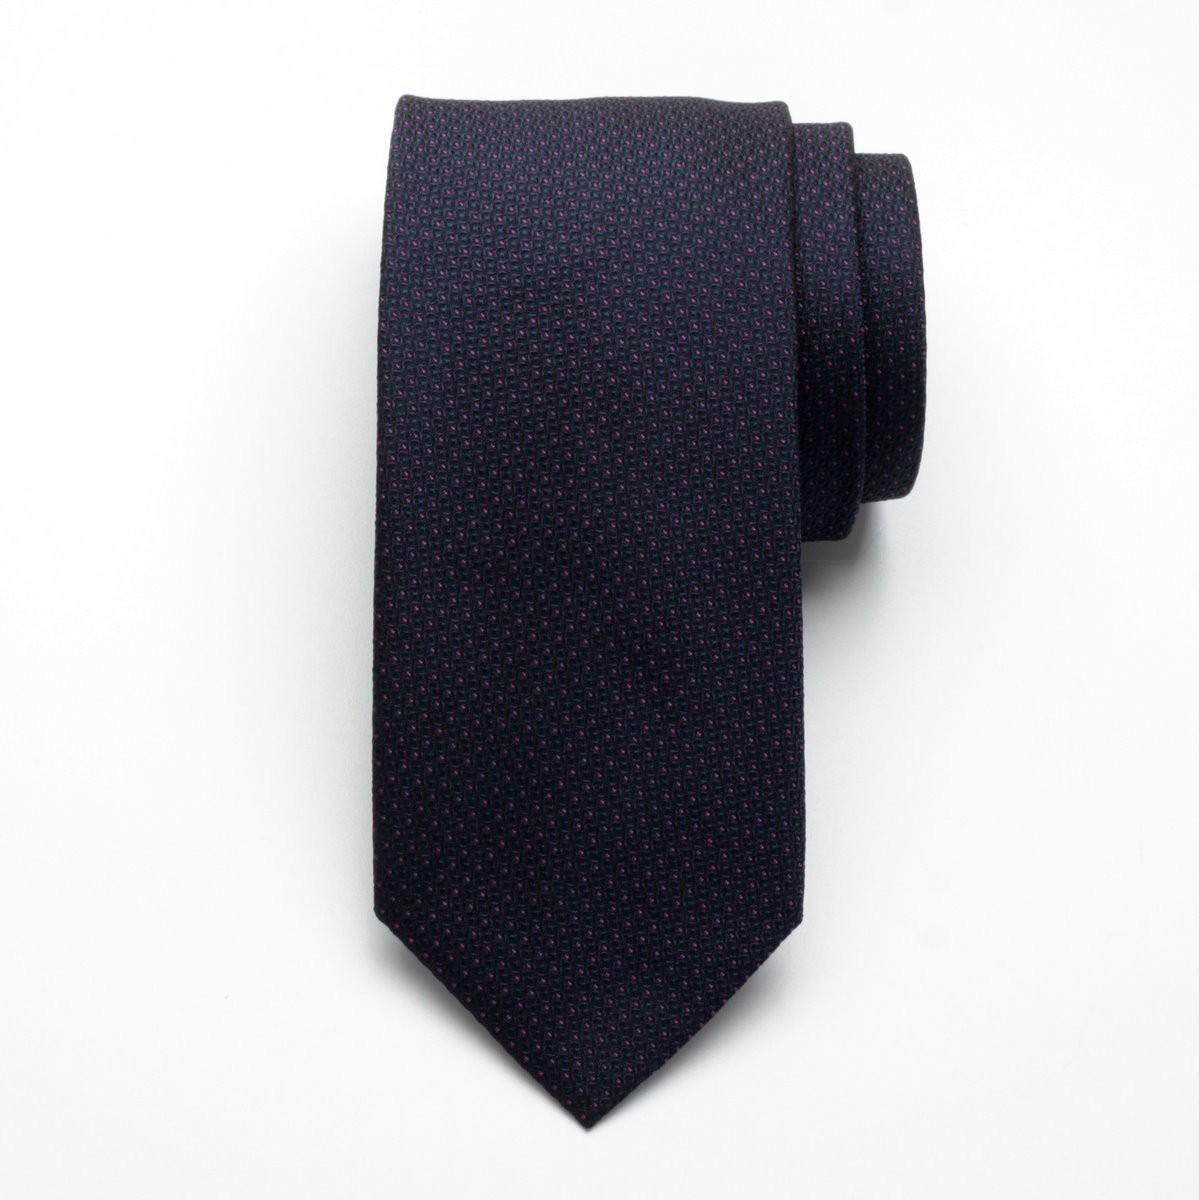 Krawat jedwabny Fine Selection (wzór 94)